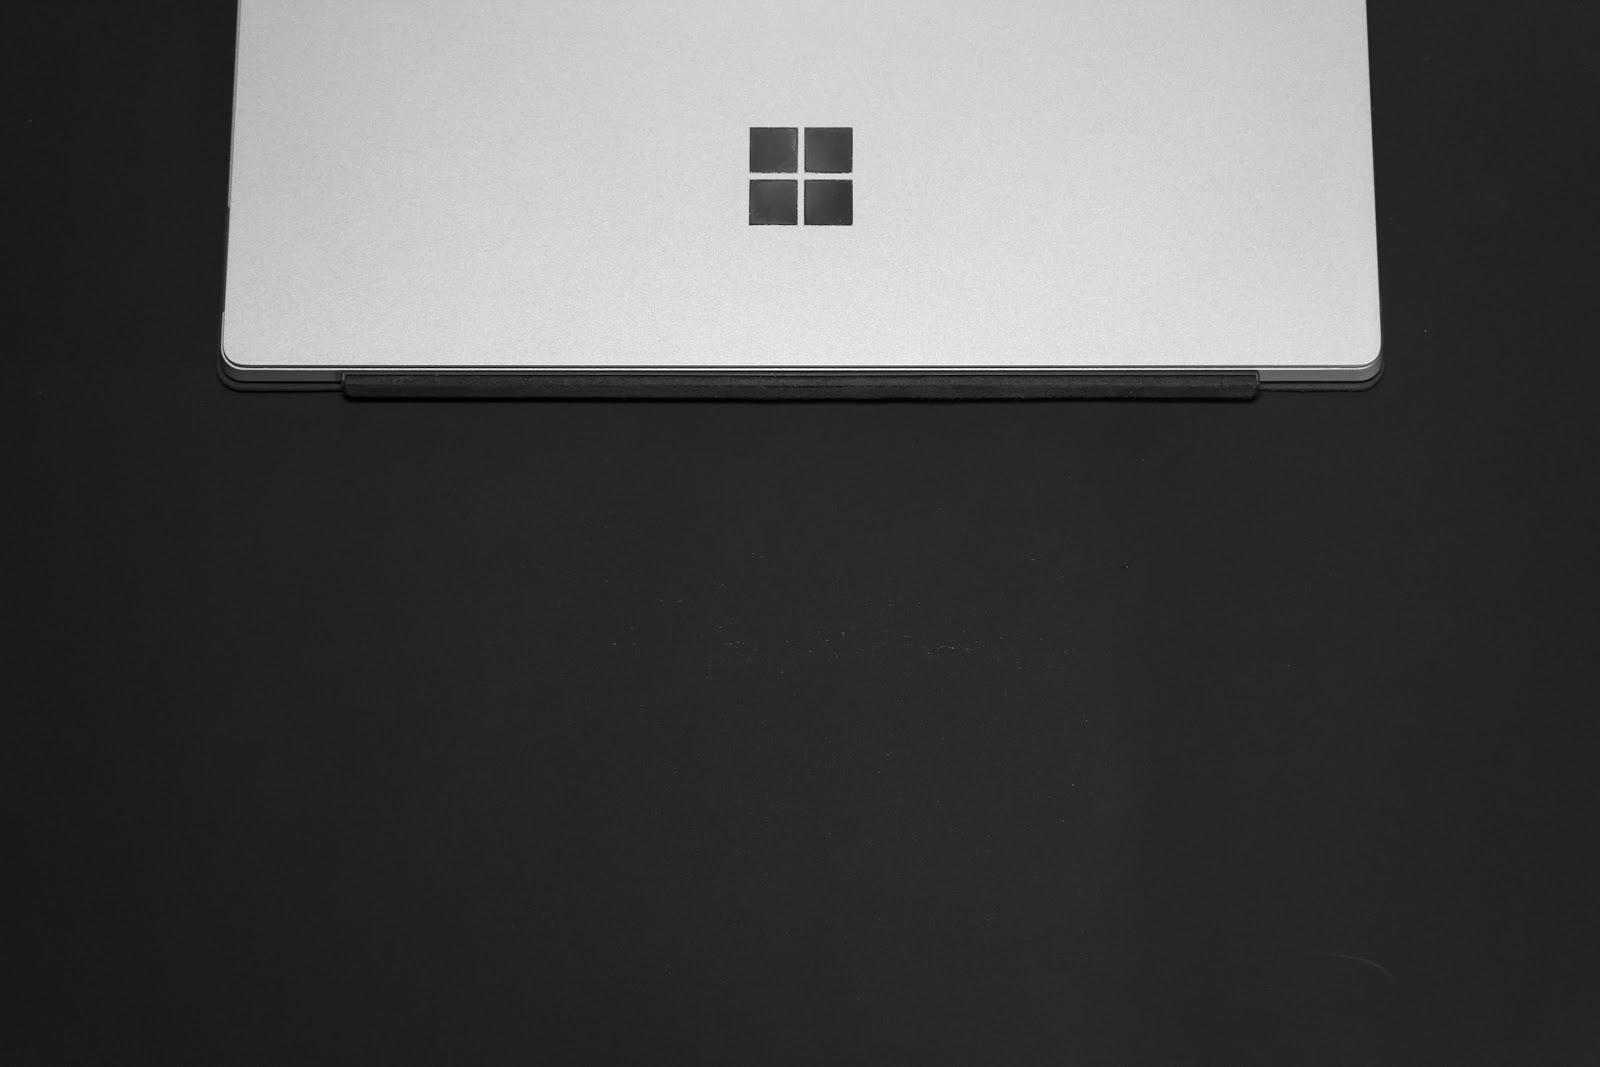 Microsoft tablet.